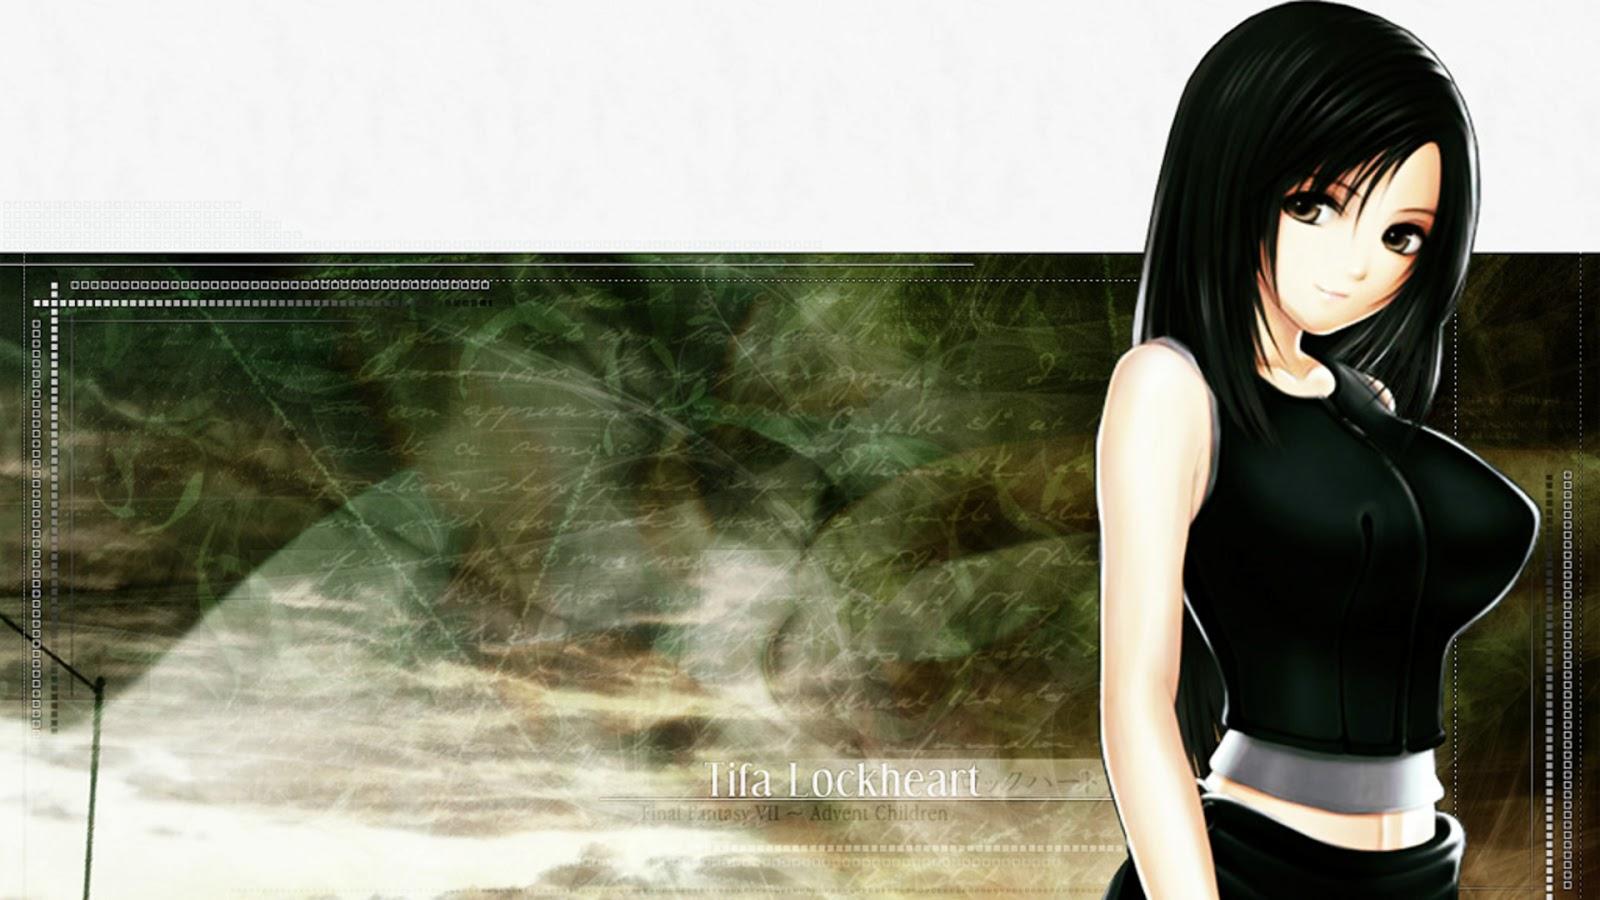 2932x2932 Tifa Lockhart Final Fantasy Artwork Ipad Pro: Final Fantasy Wallpaper